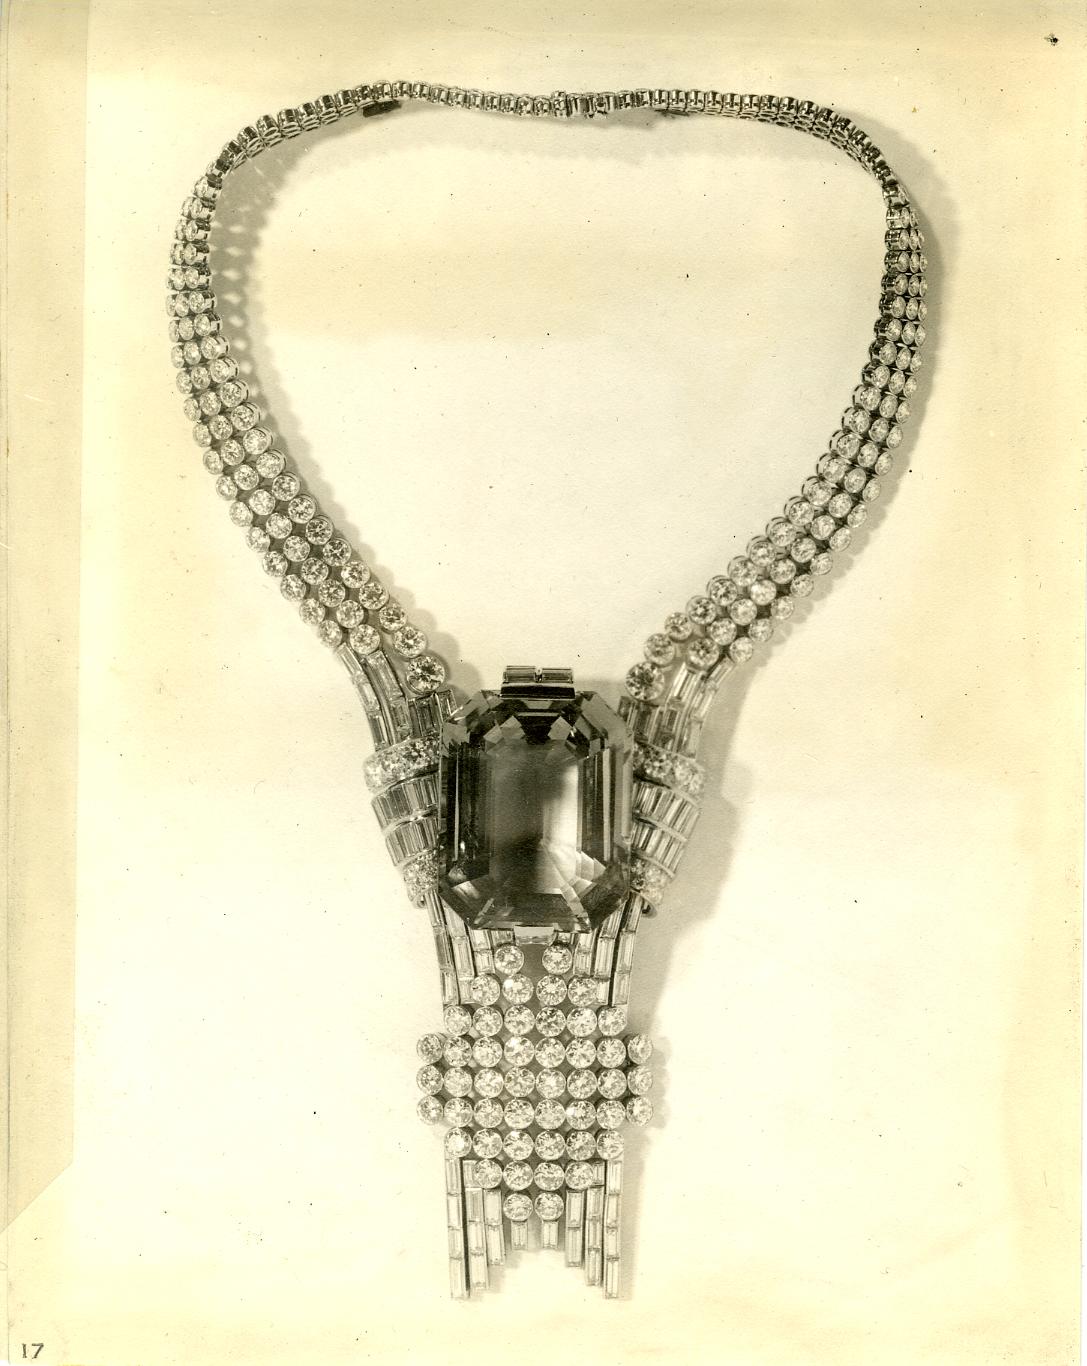 Tiffany & Co. maakt duurste halsketting ter wereld - 1